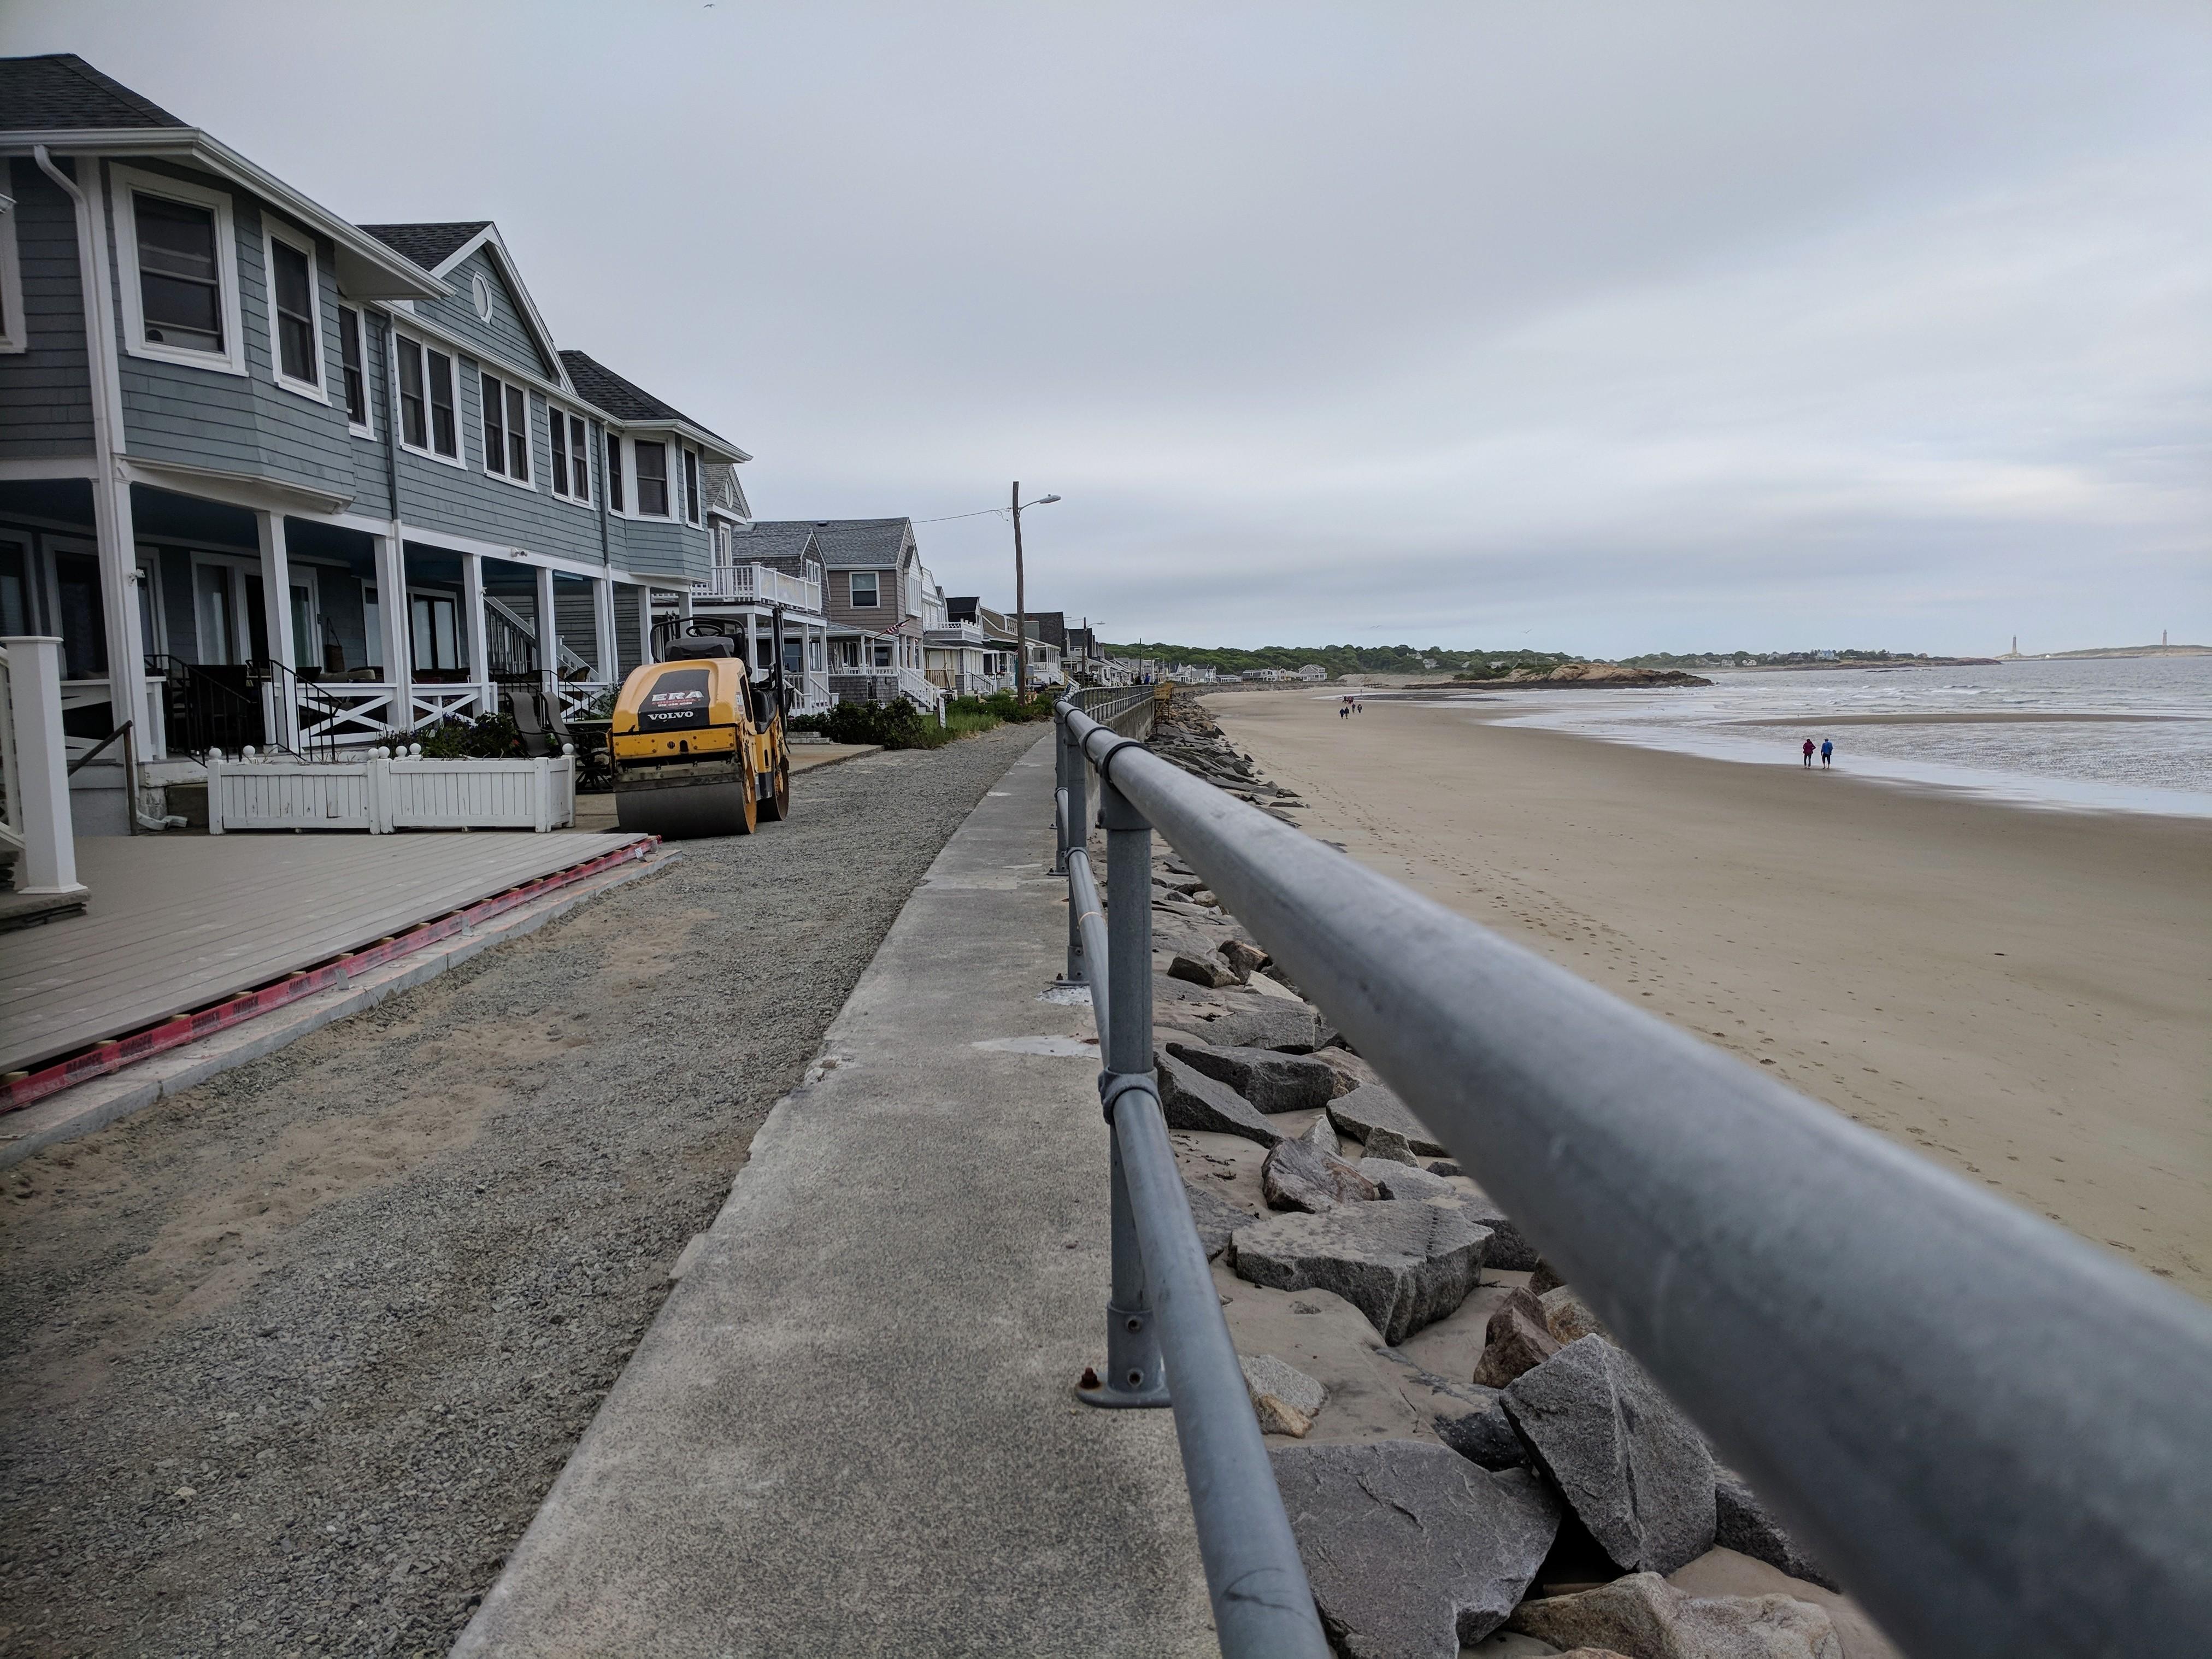 cottage walkway widened Long Beach seawall Gloucester MA Rockport MA_20180613_173625 ©c ryan.jpg